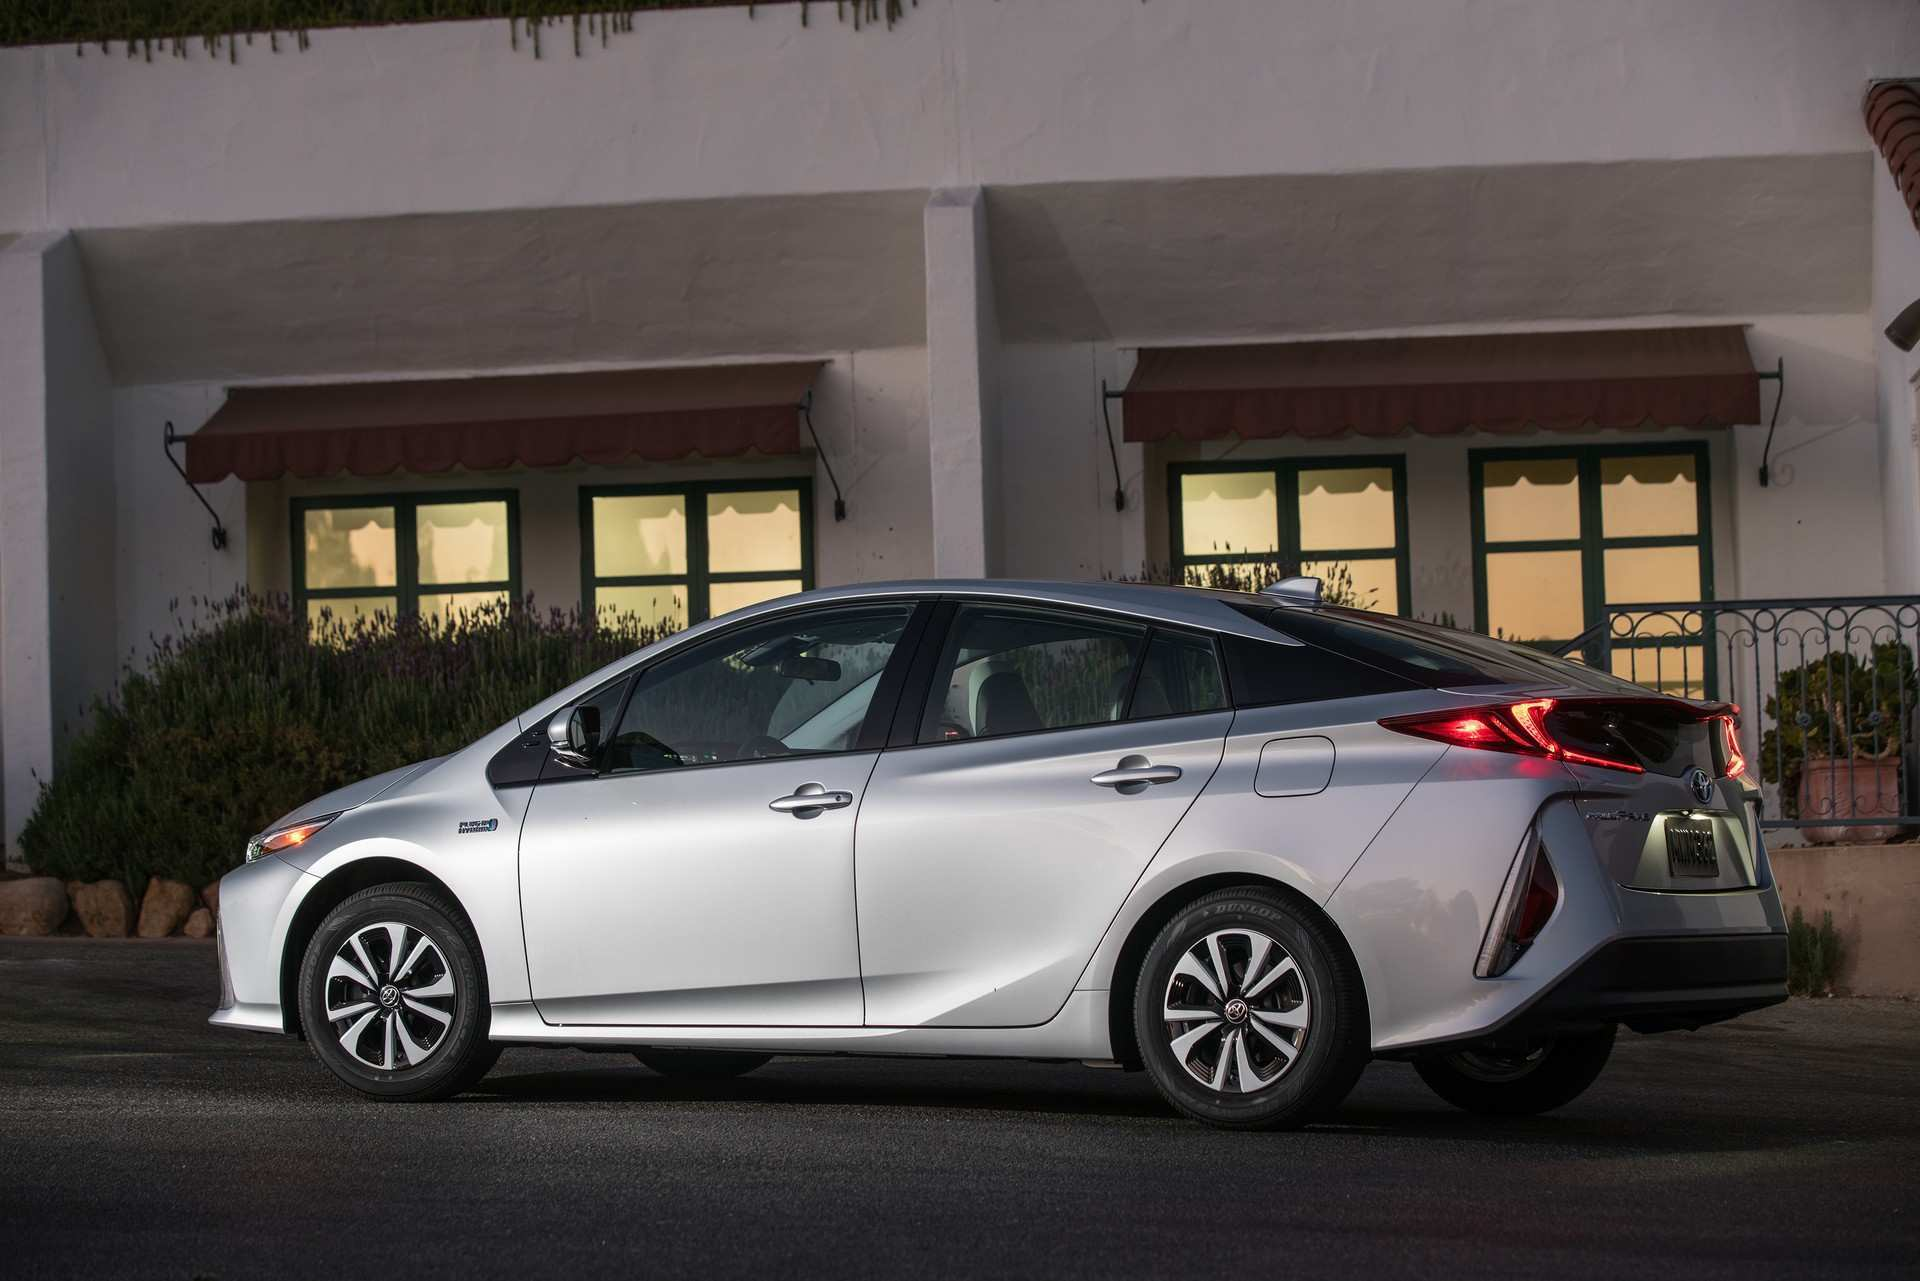 25 New Toyota Prius Prime 2020 Picture with Toyota Prius Prime 2020